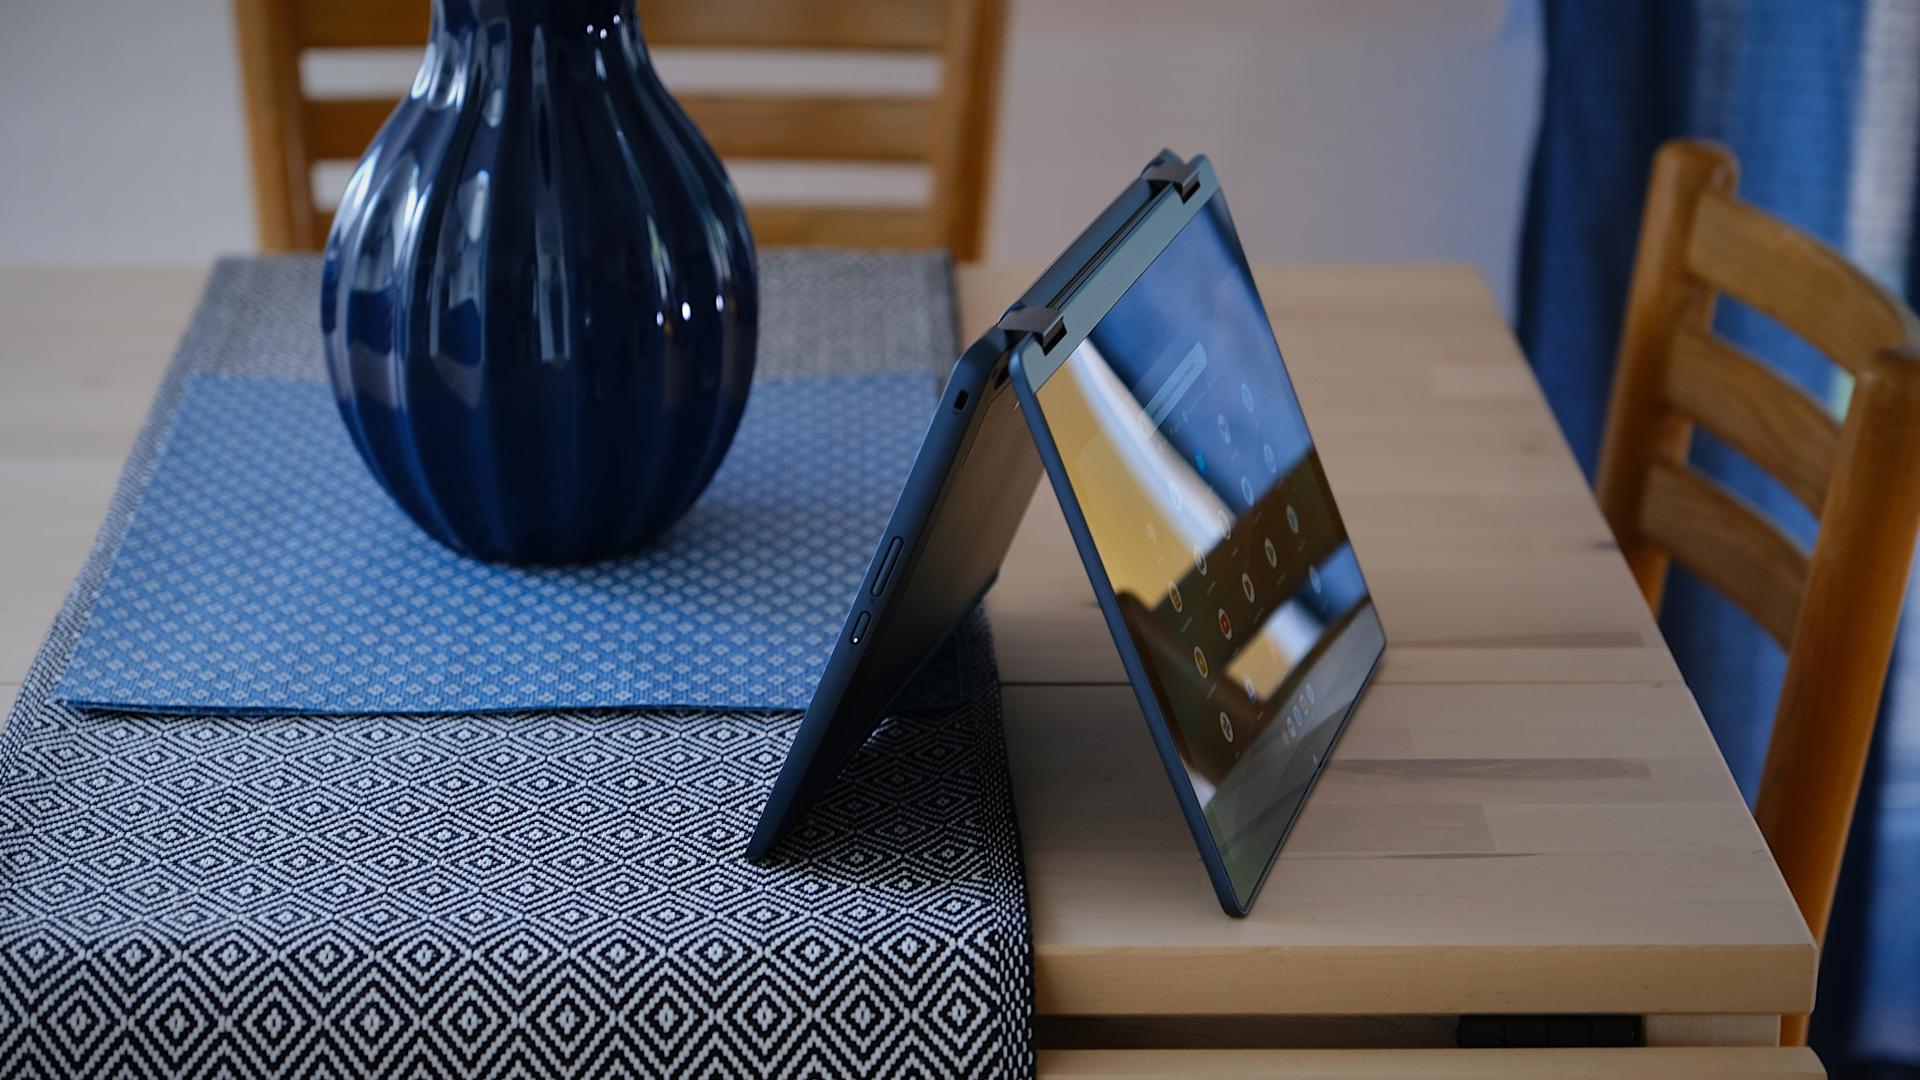 Conclusion Lenovo IdeaPad Flex 3 Chromebook